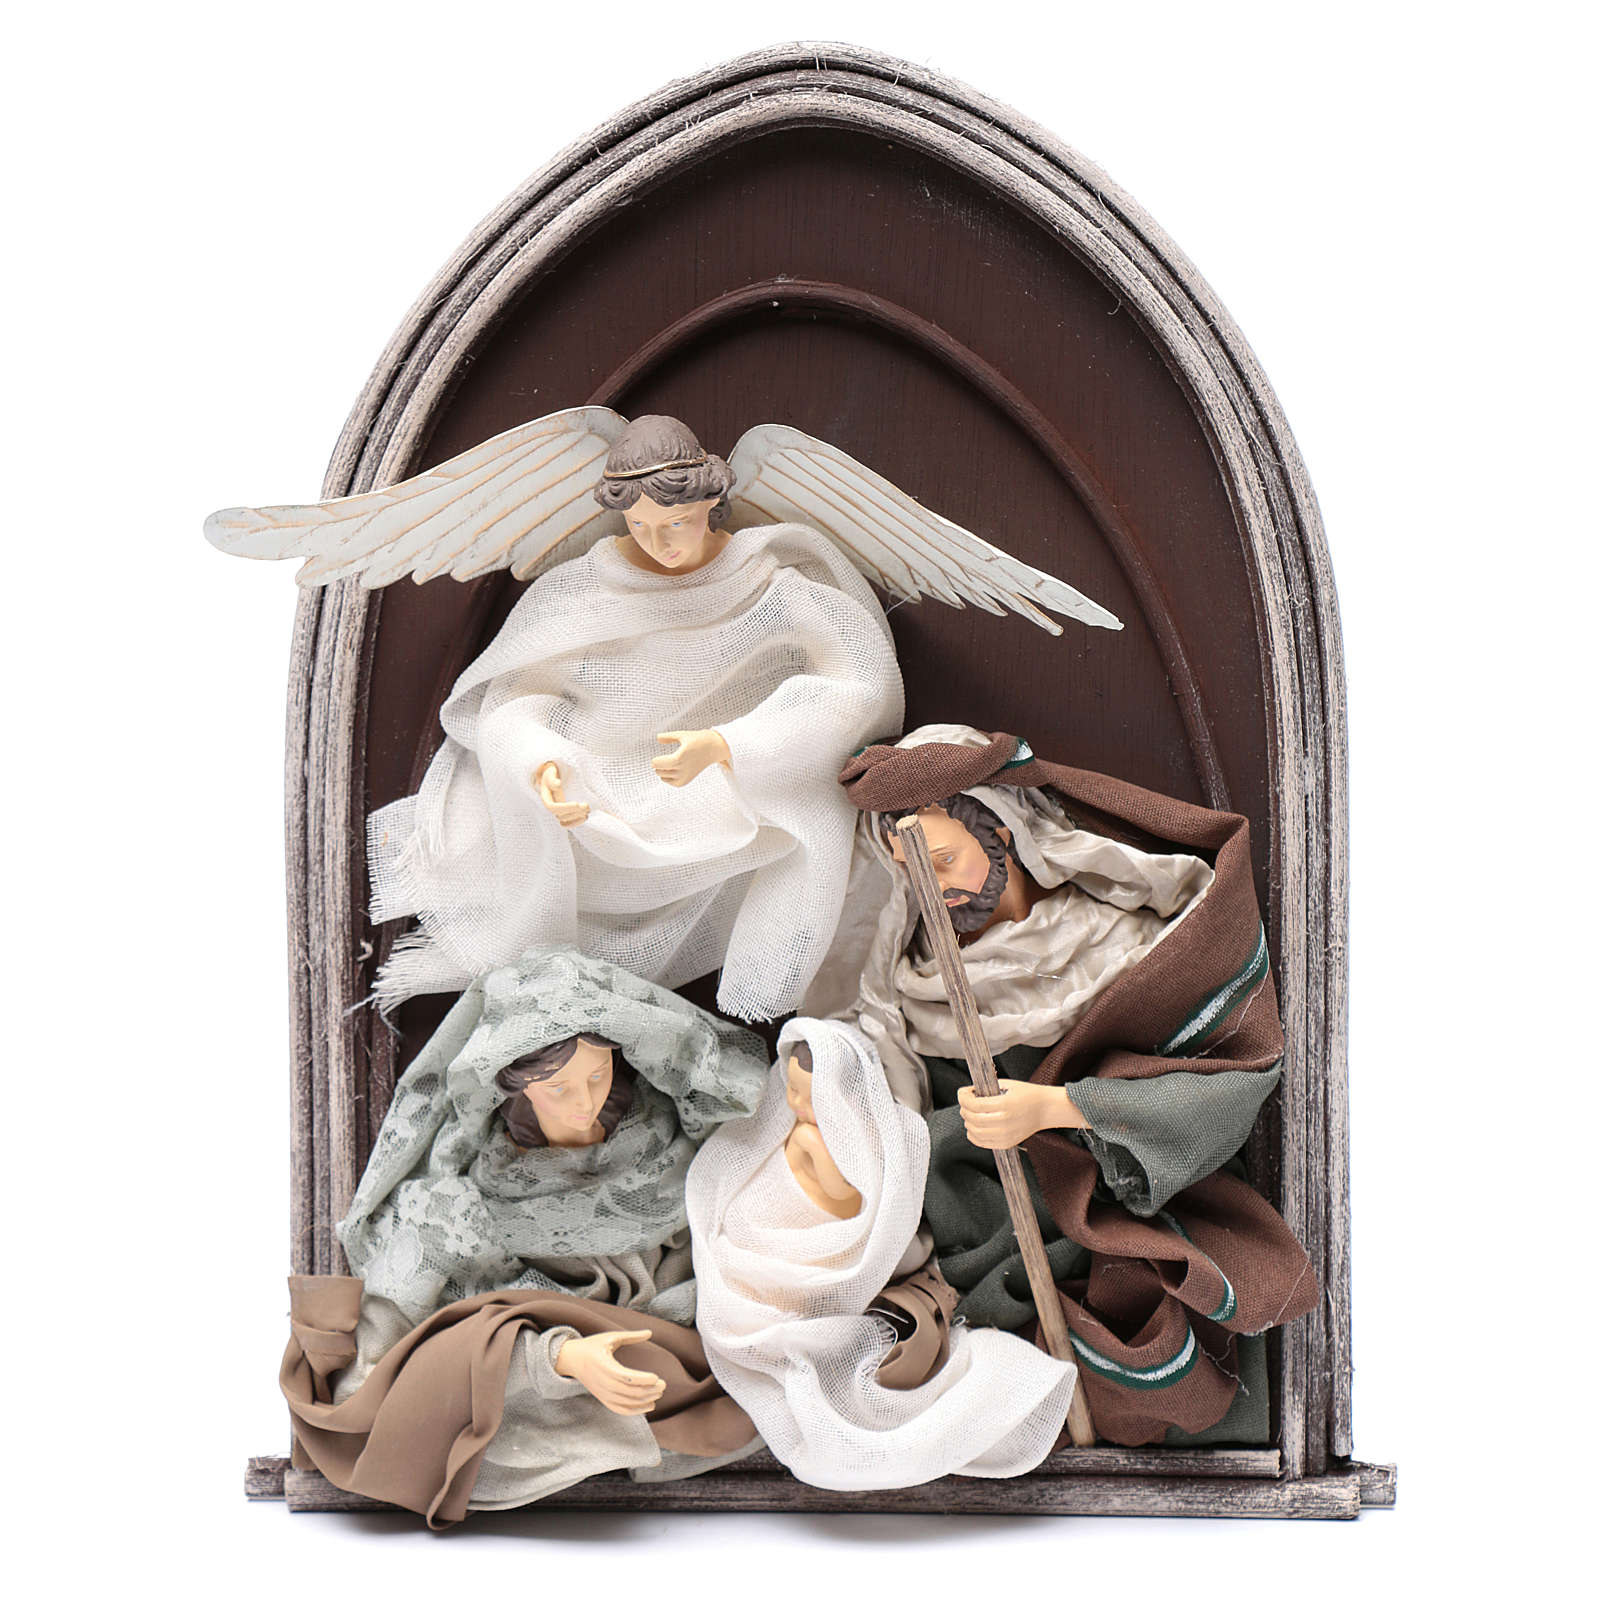 Scena natività e angelo resina in rilievo in quadro 40 cm 3